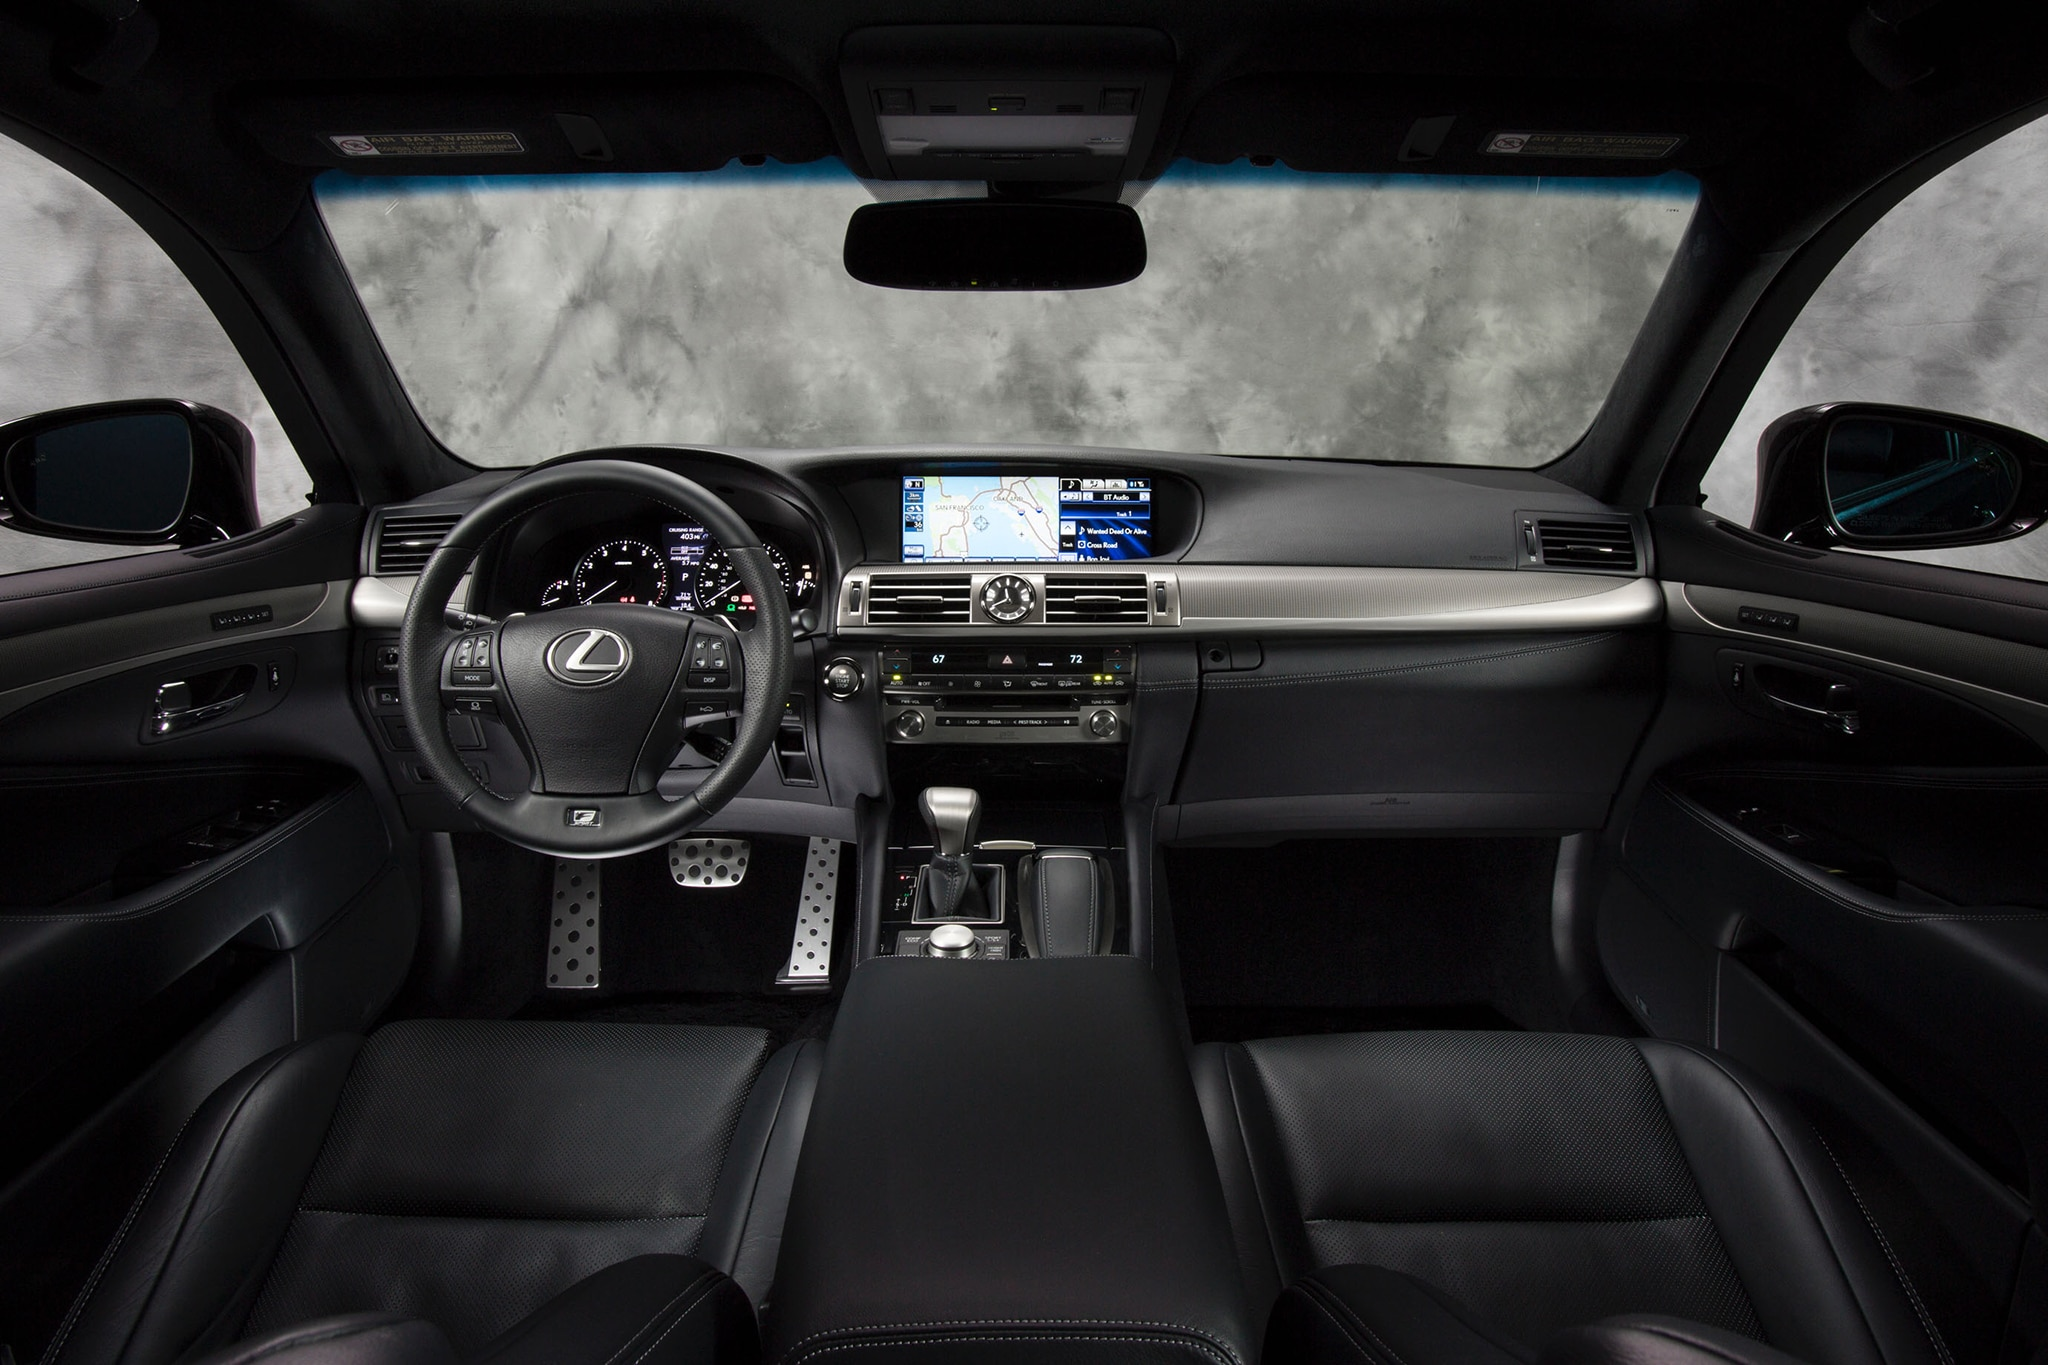 http://st.automobilemag.com/uploads/sites/10/2015/09/2013-lexus-LS-460-F-sport-front-interior-view.jpg